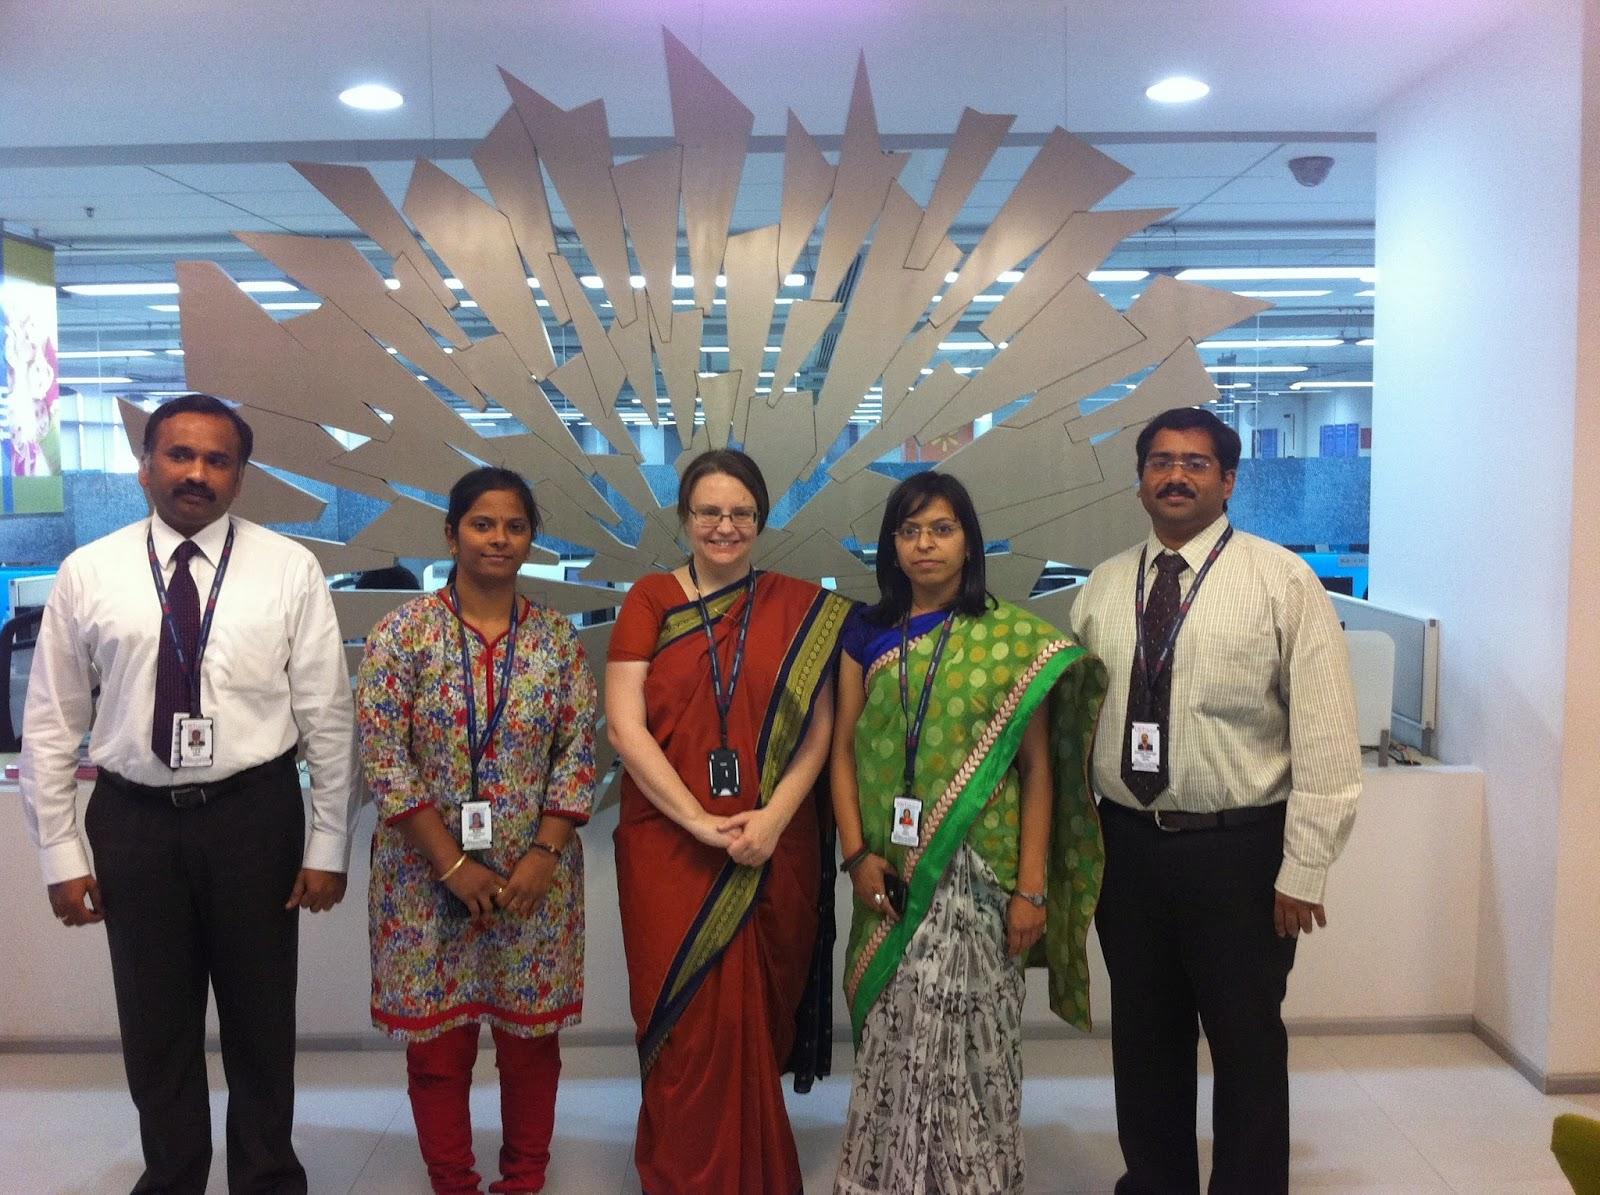 UST Global Bangalore